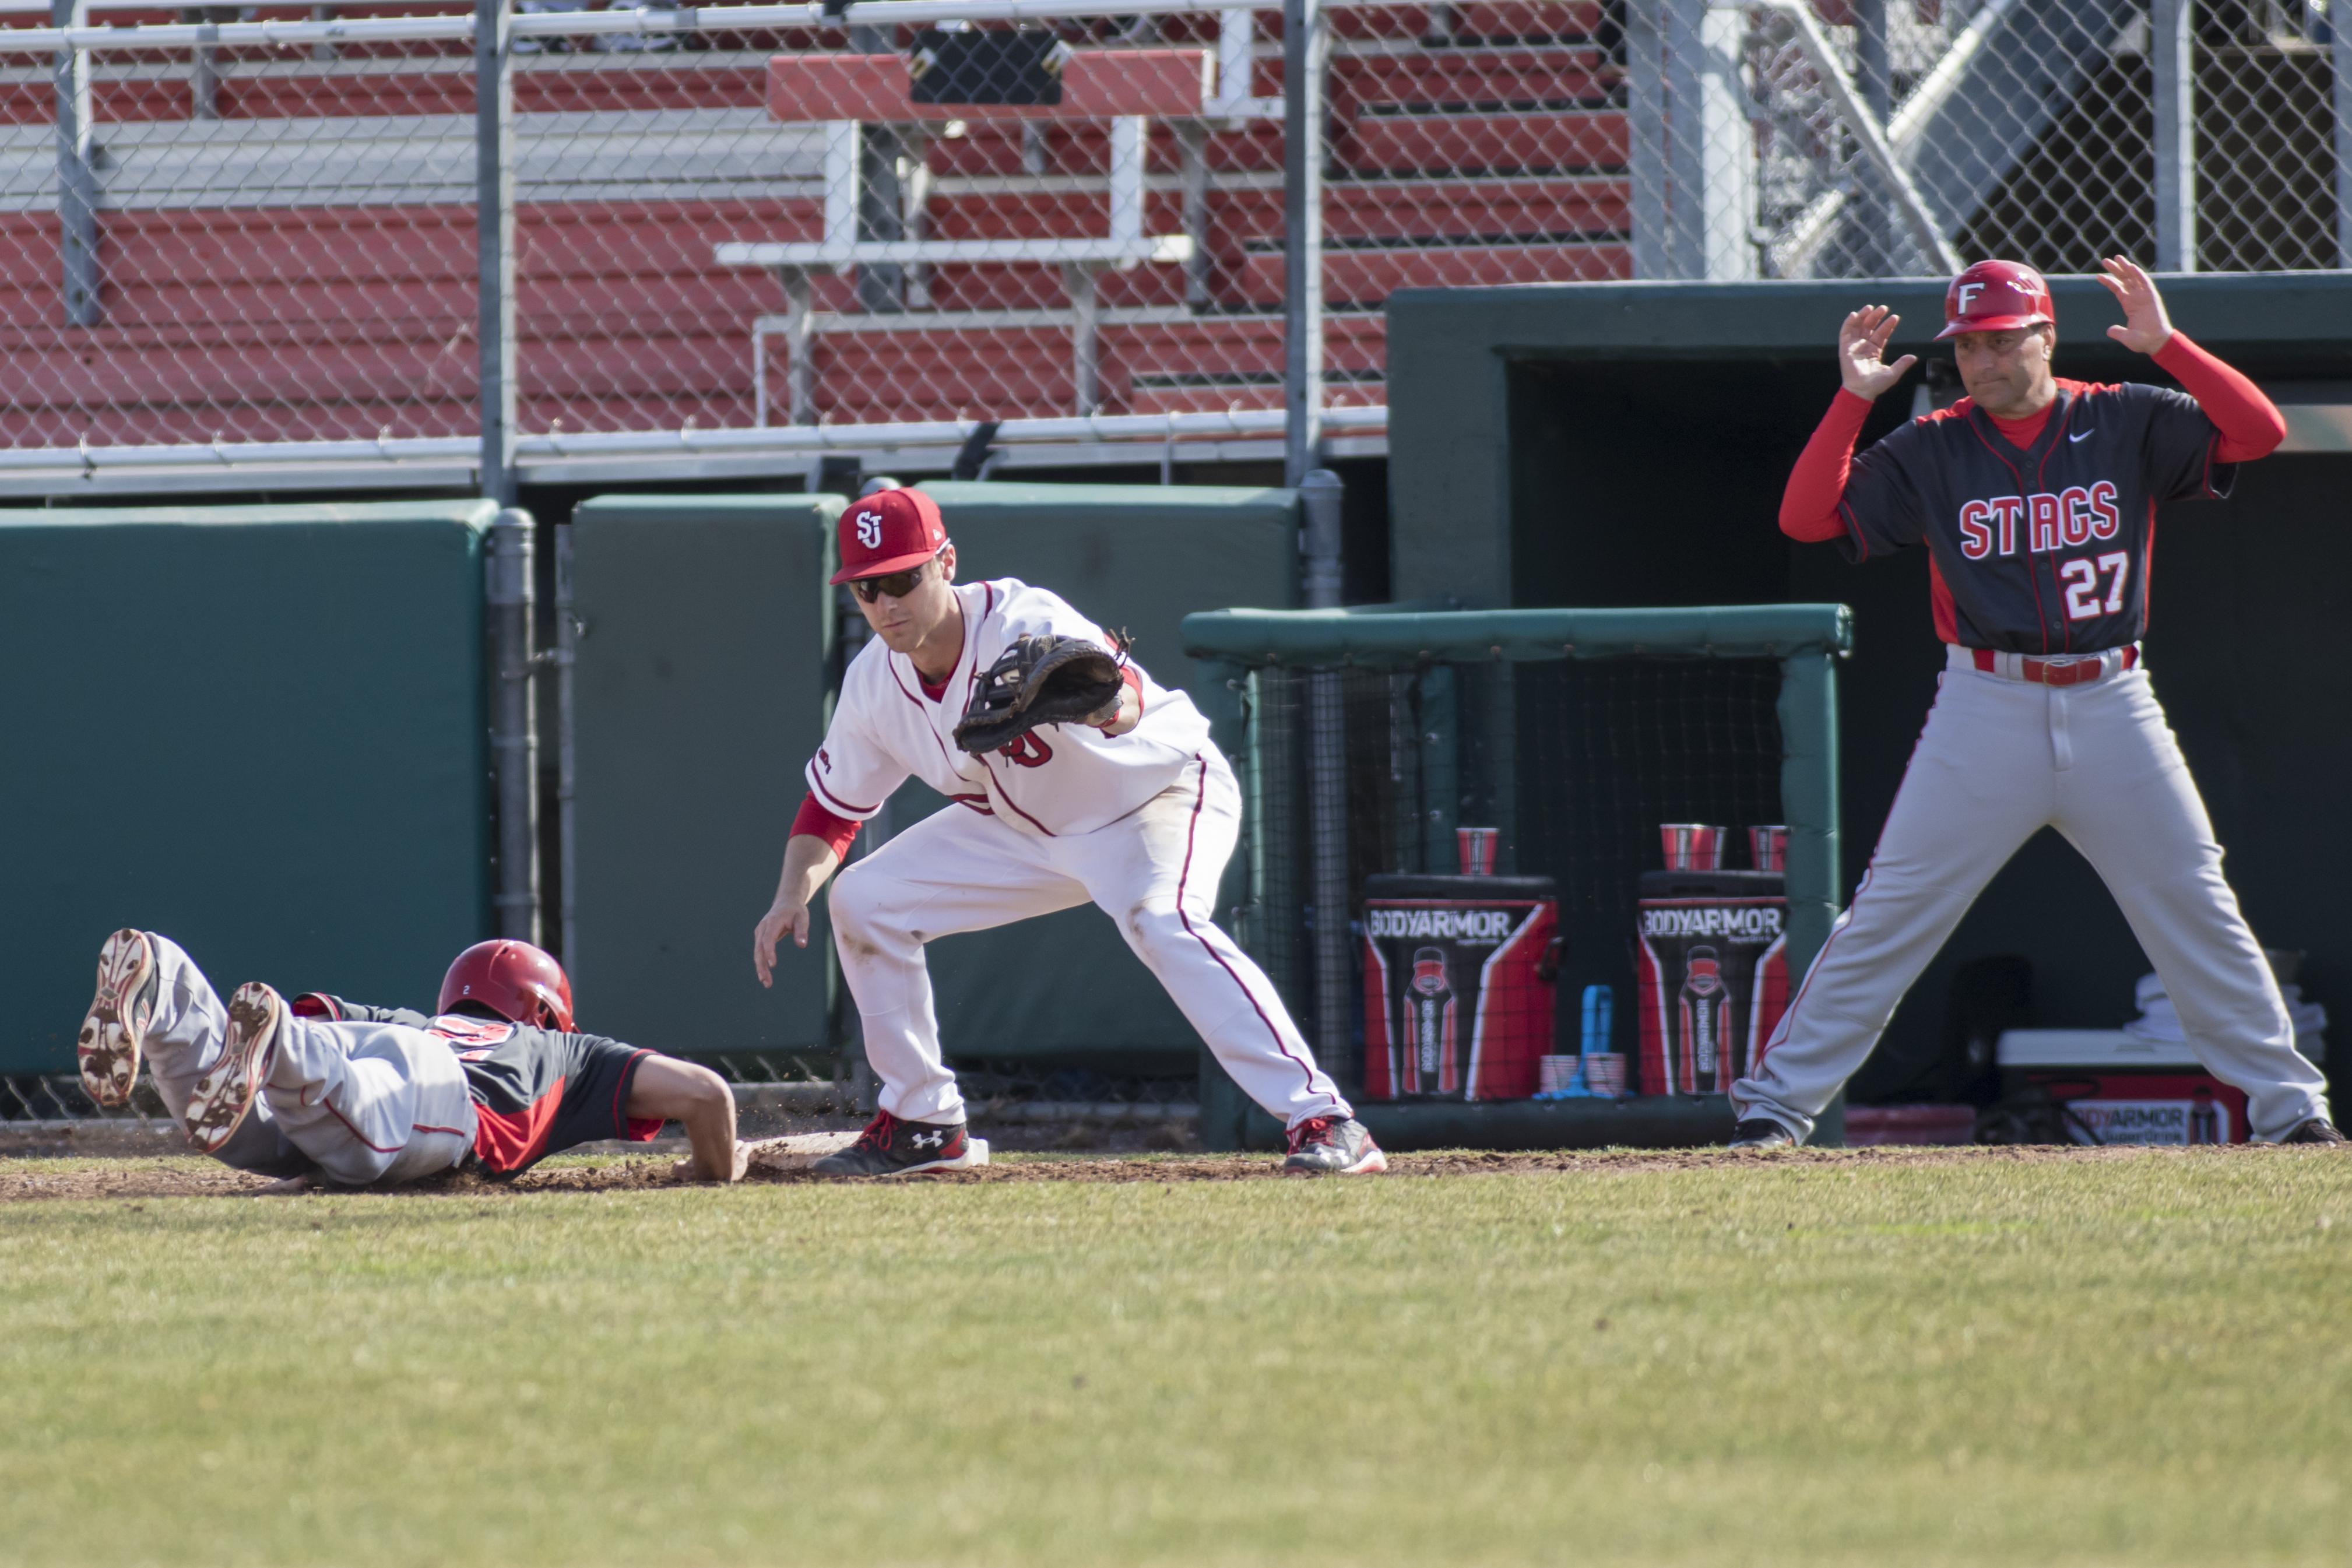 SJU vs Fairfield baseball